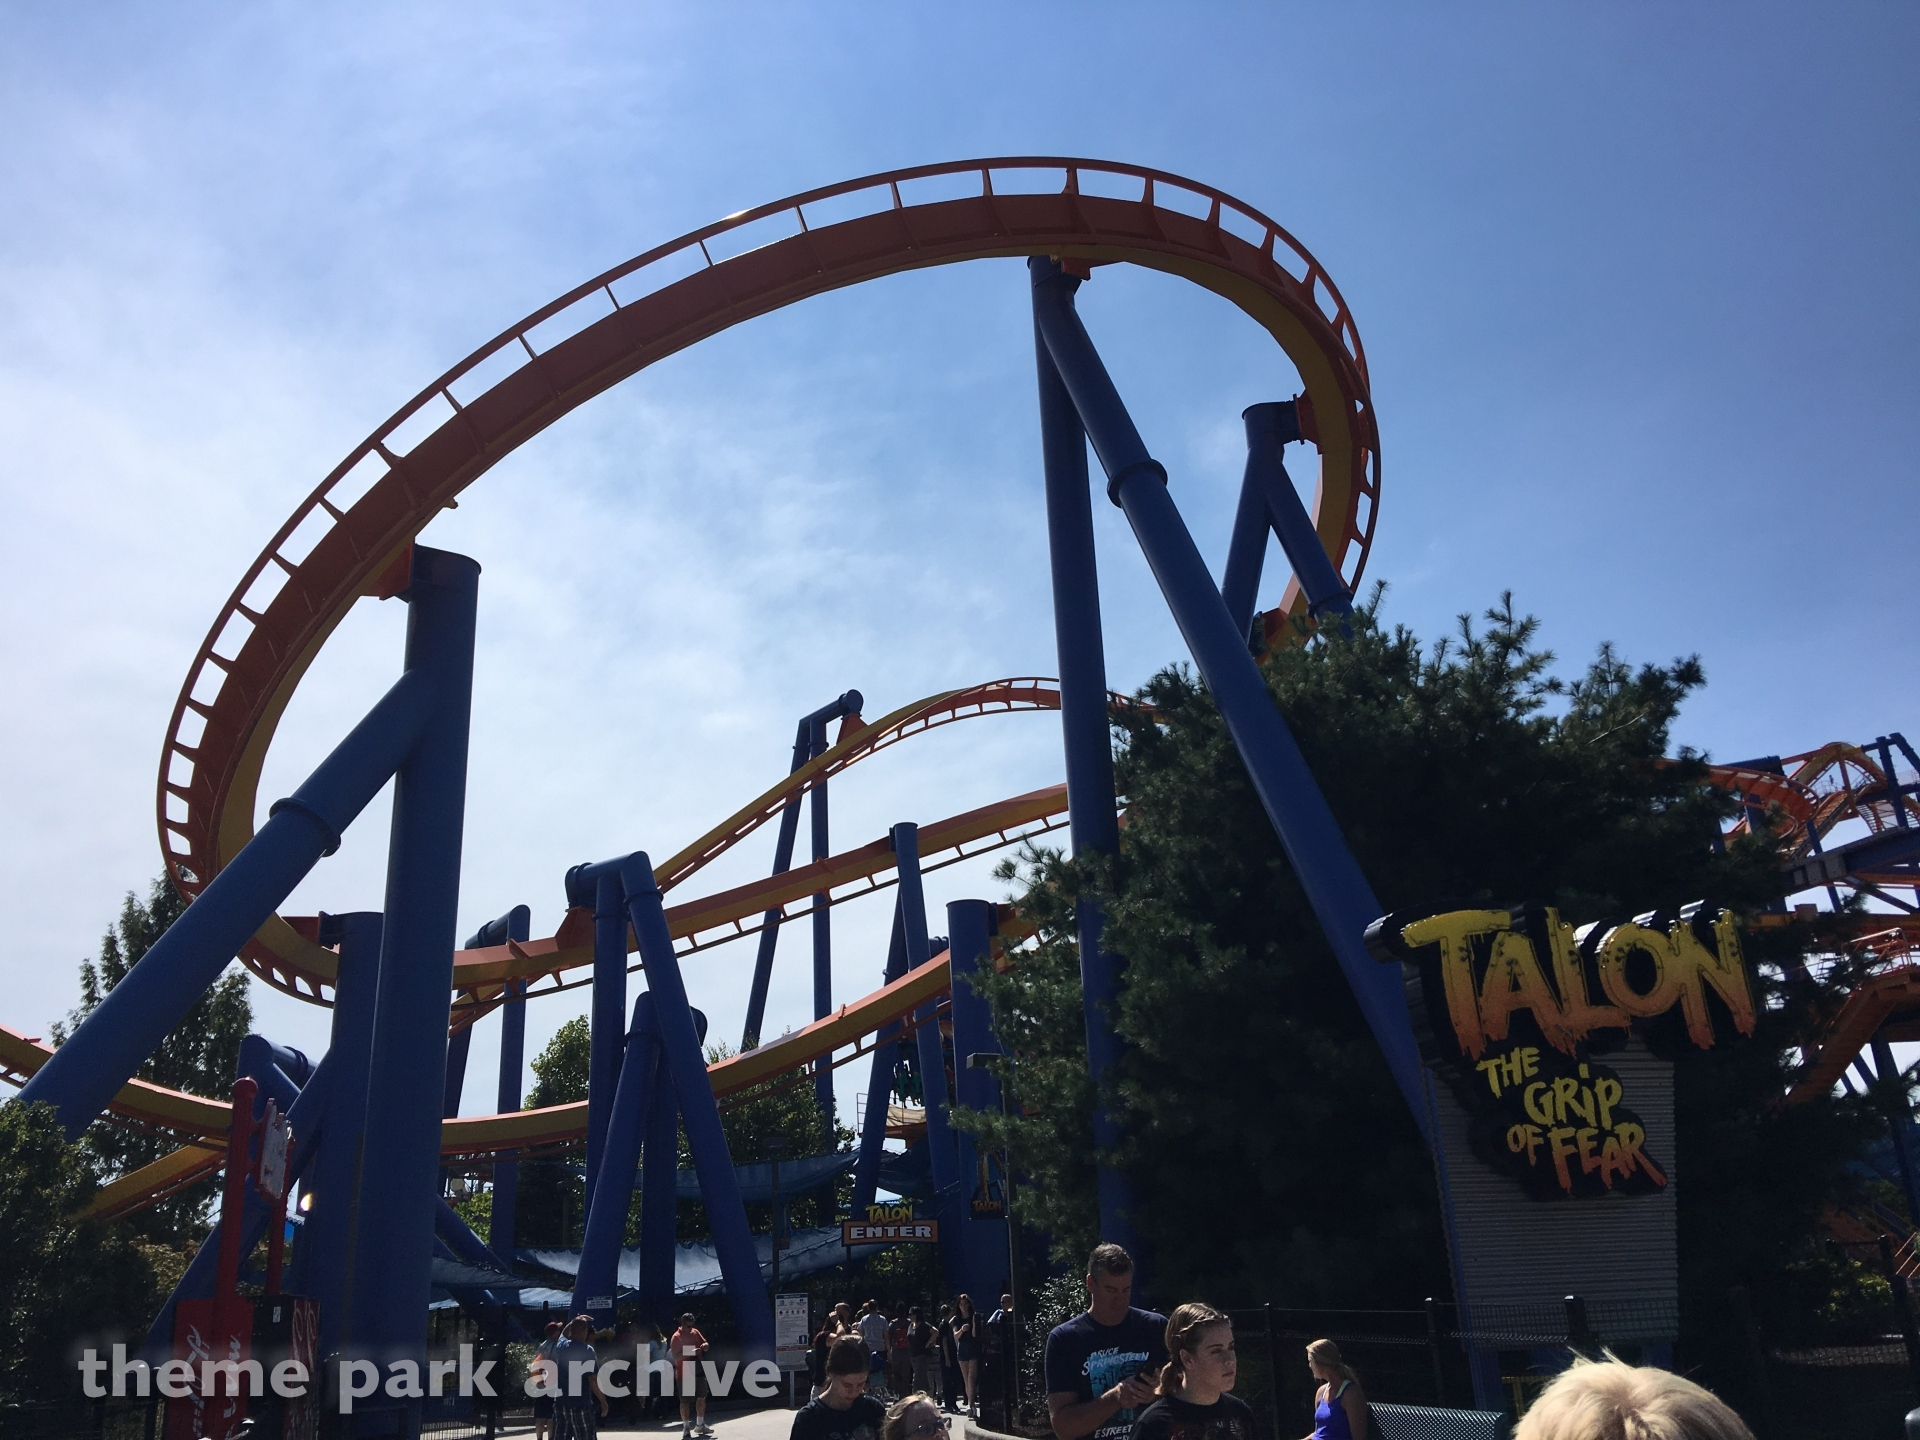 Talon at Dorney Park